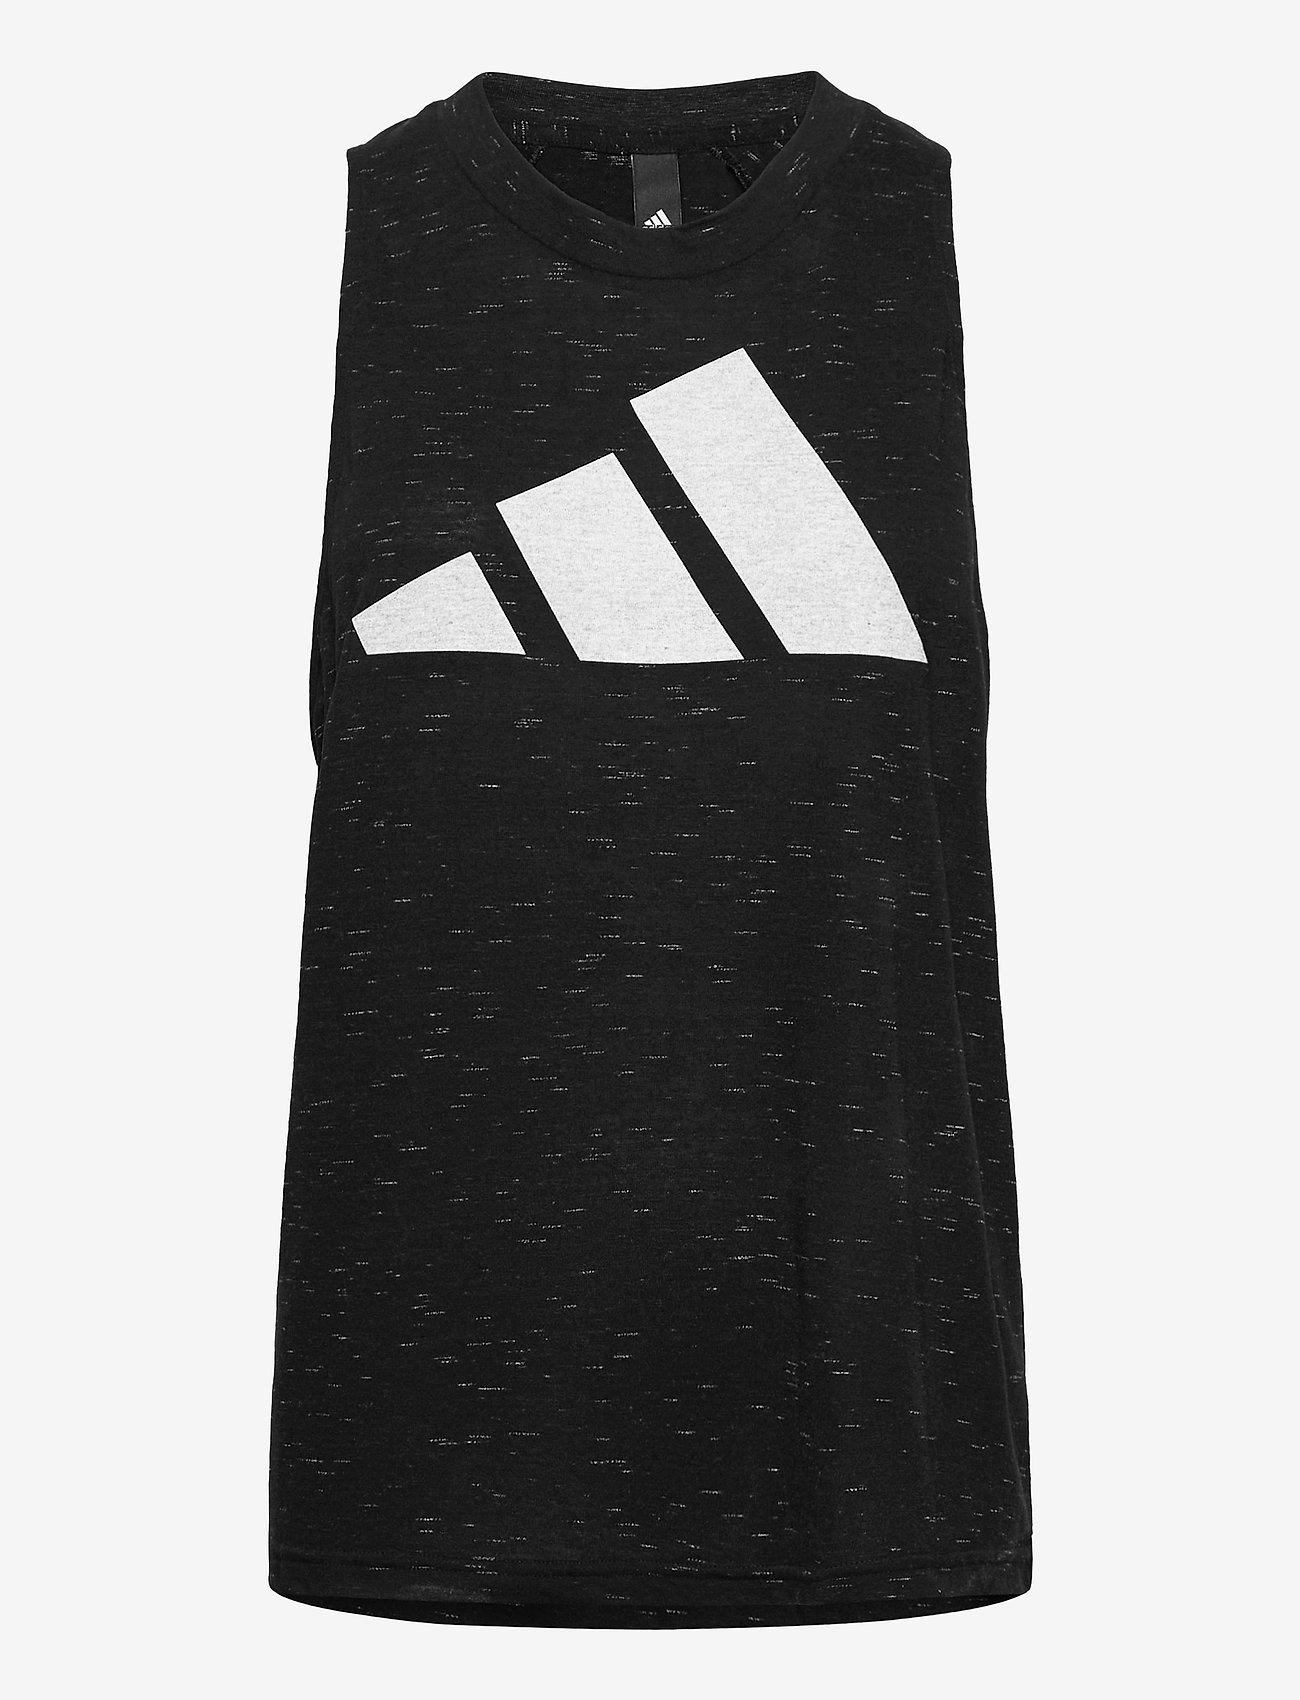 adidas Performance - Sportswear Winners 2.0 Tank Top W - topjes - blckme - 1